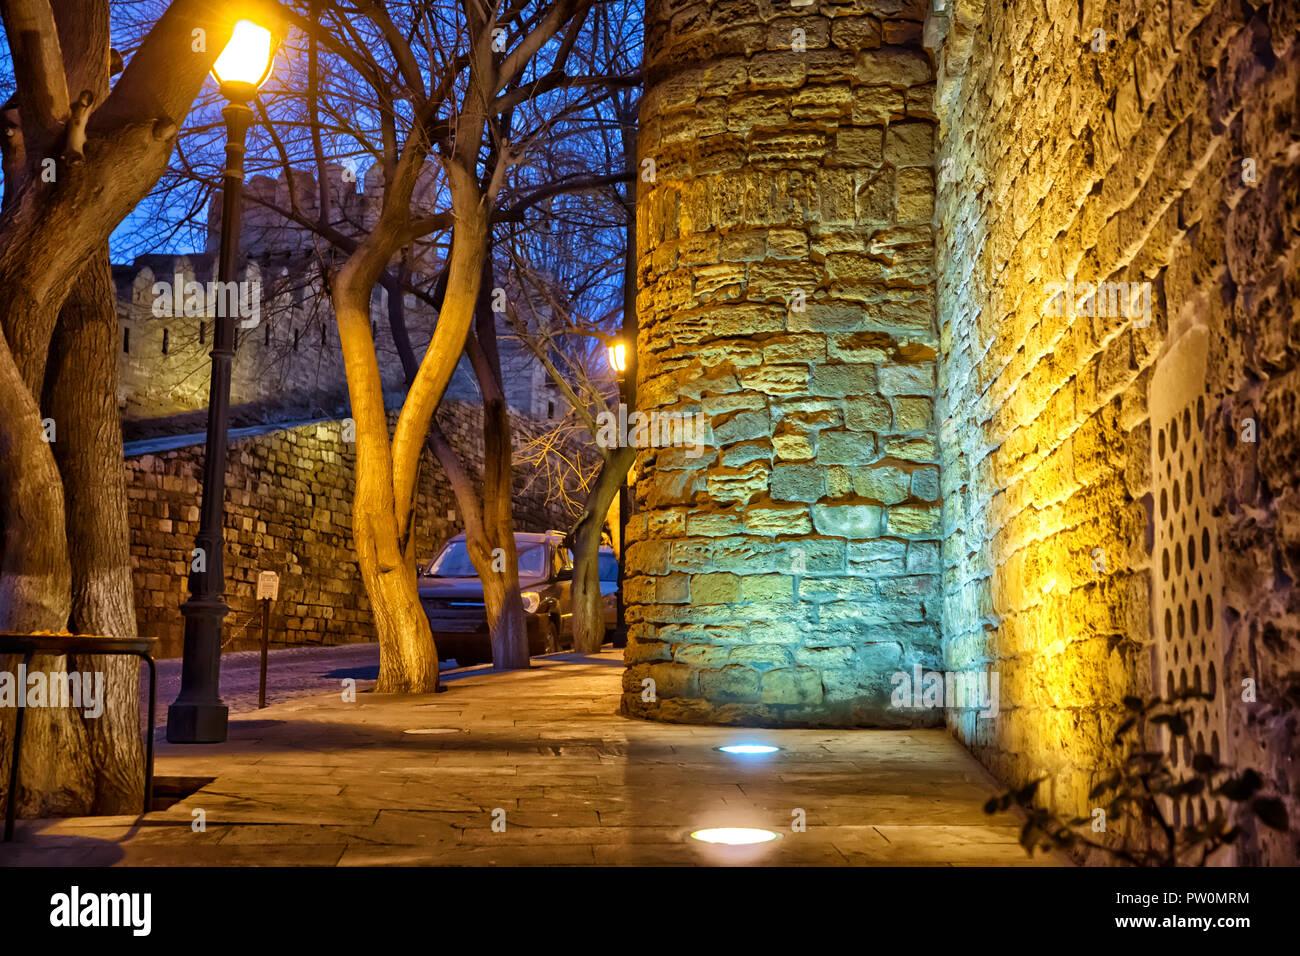 The fortress gates of the old city in the illumination . Icheri Sheher in night Baku. Azerbaijan . Gate of the old fortress, entrance to Baku old town - Stock Image